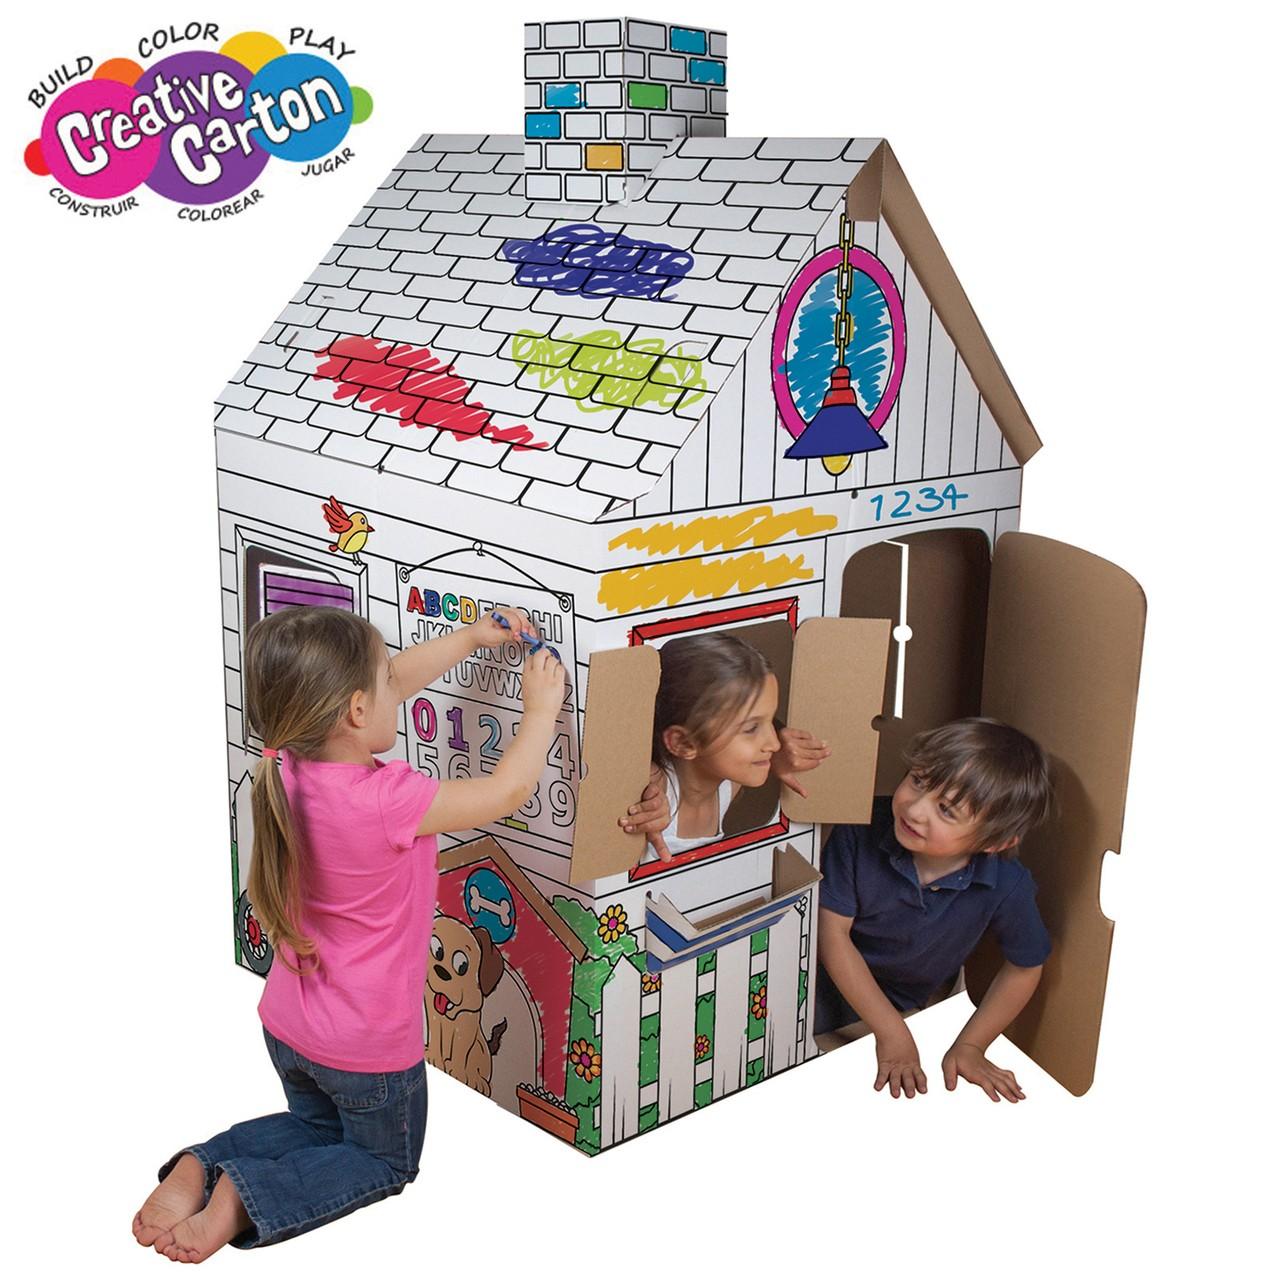 Color & Create Cardboard Playhouse - Creative Carton ...